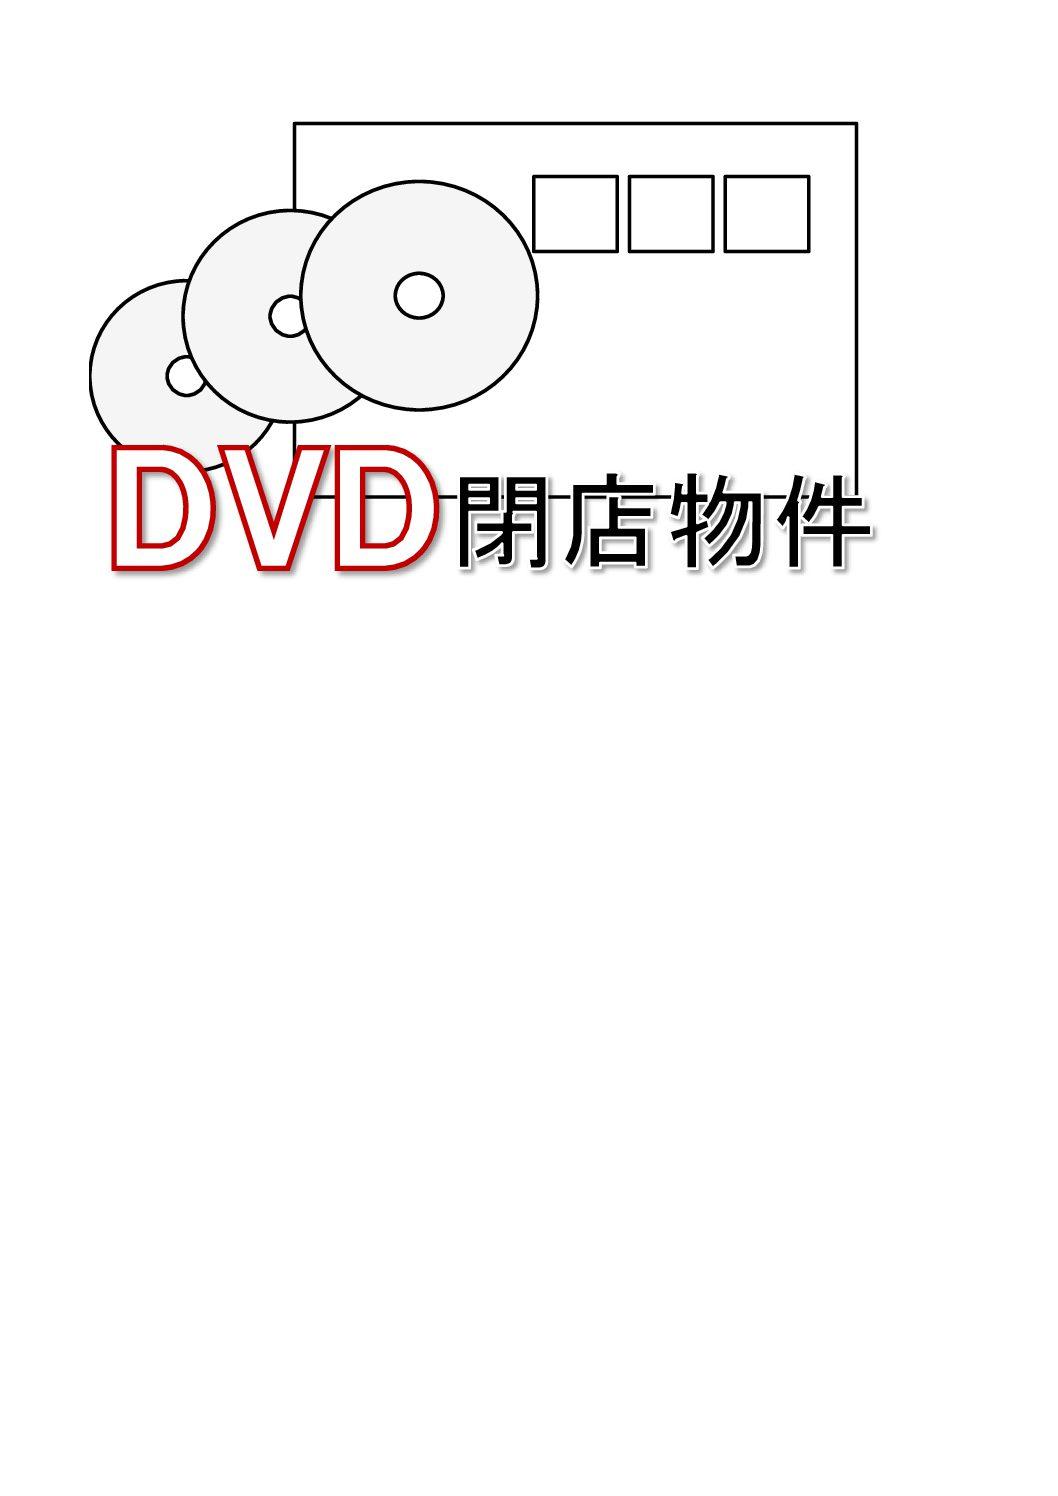 【NEW】閉店物件 レンタル用 中古DVD 一般作【a-31 OIT】